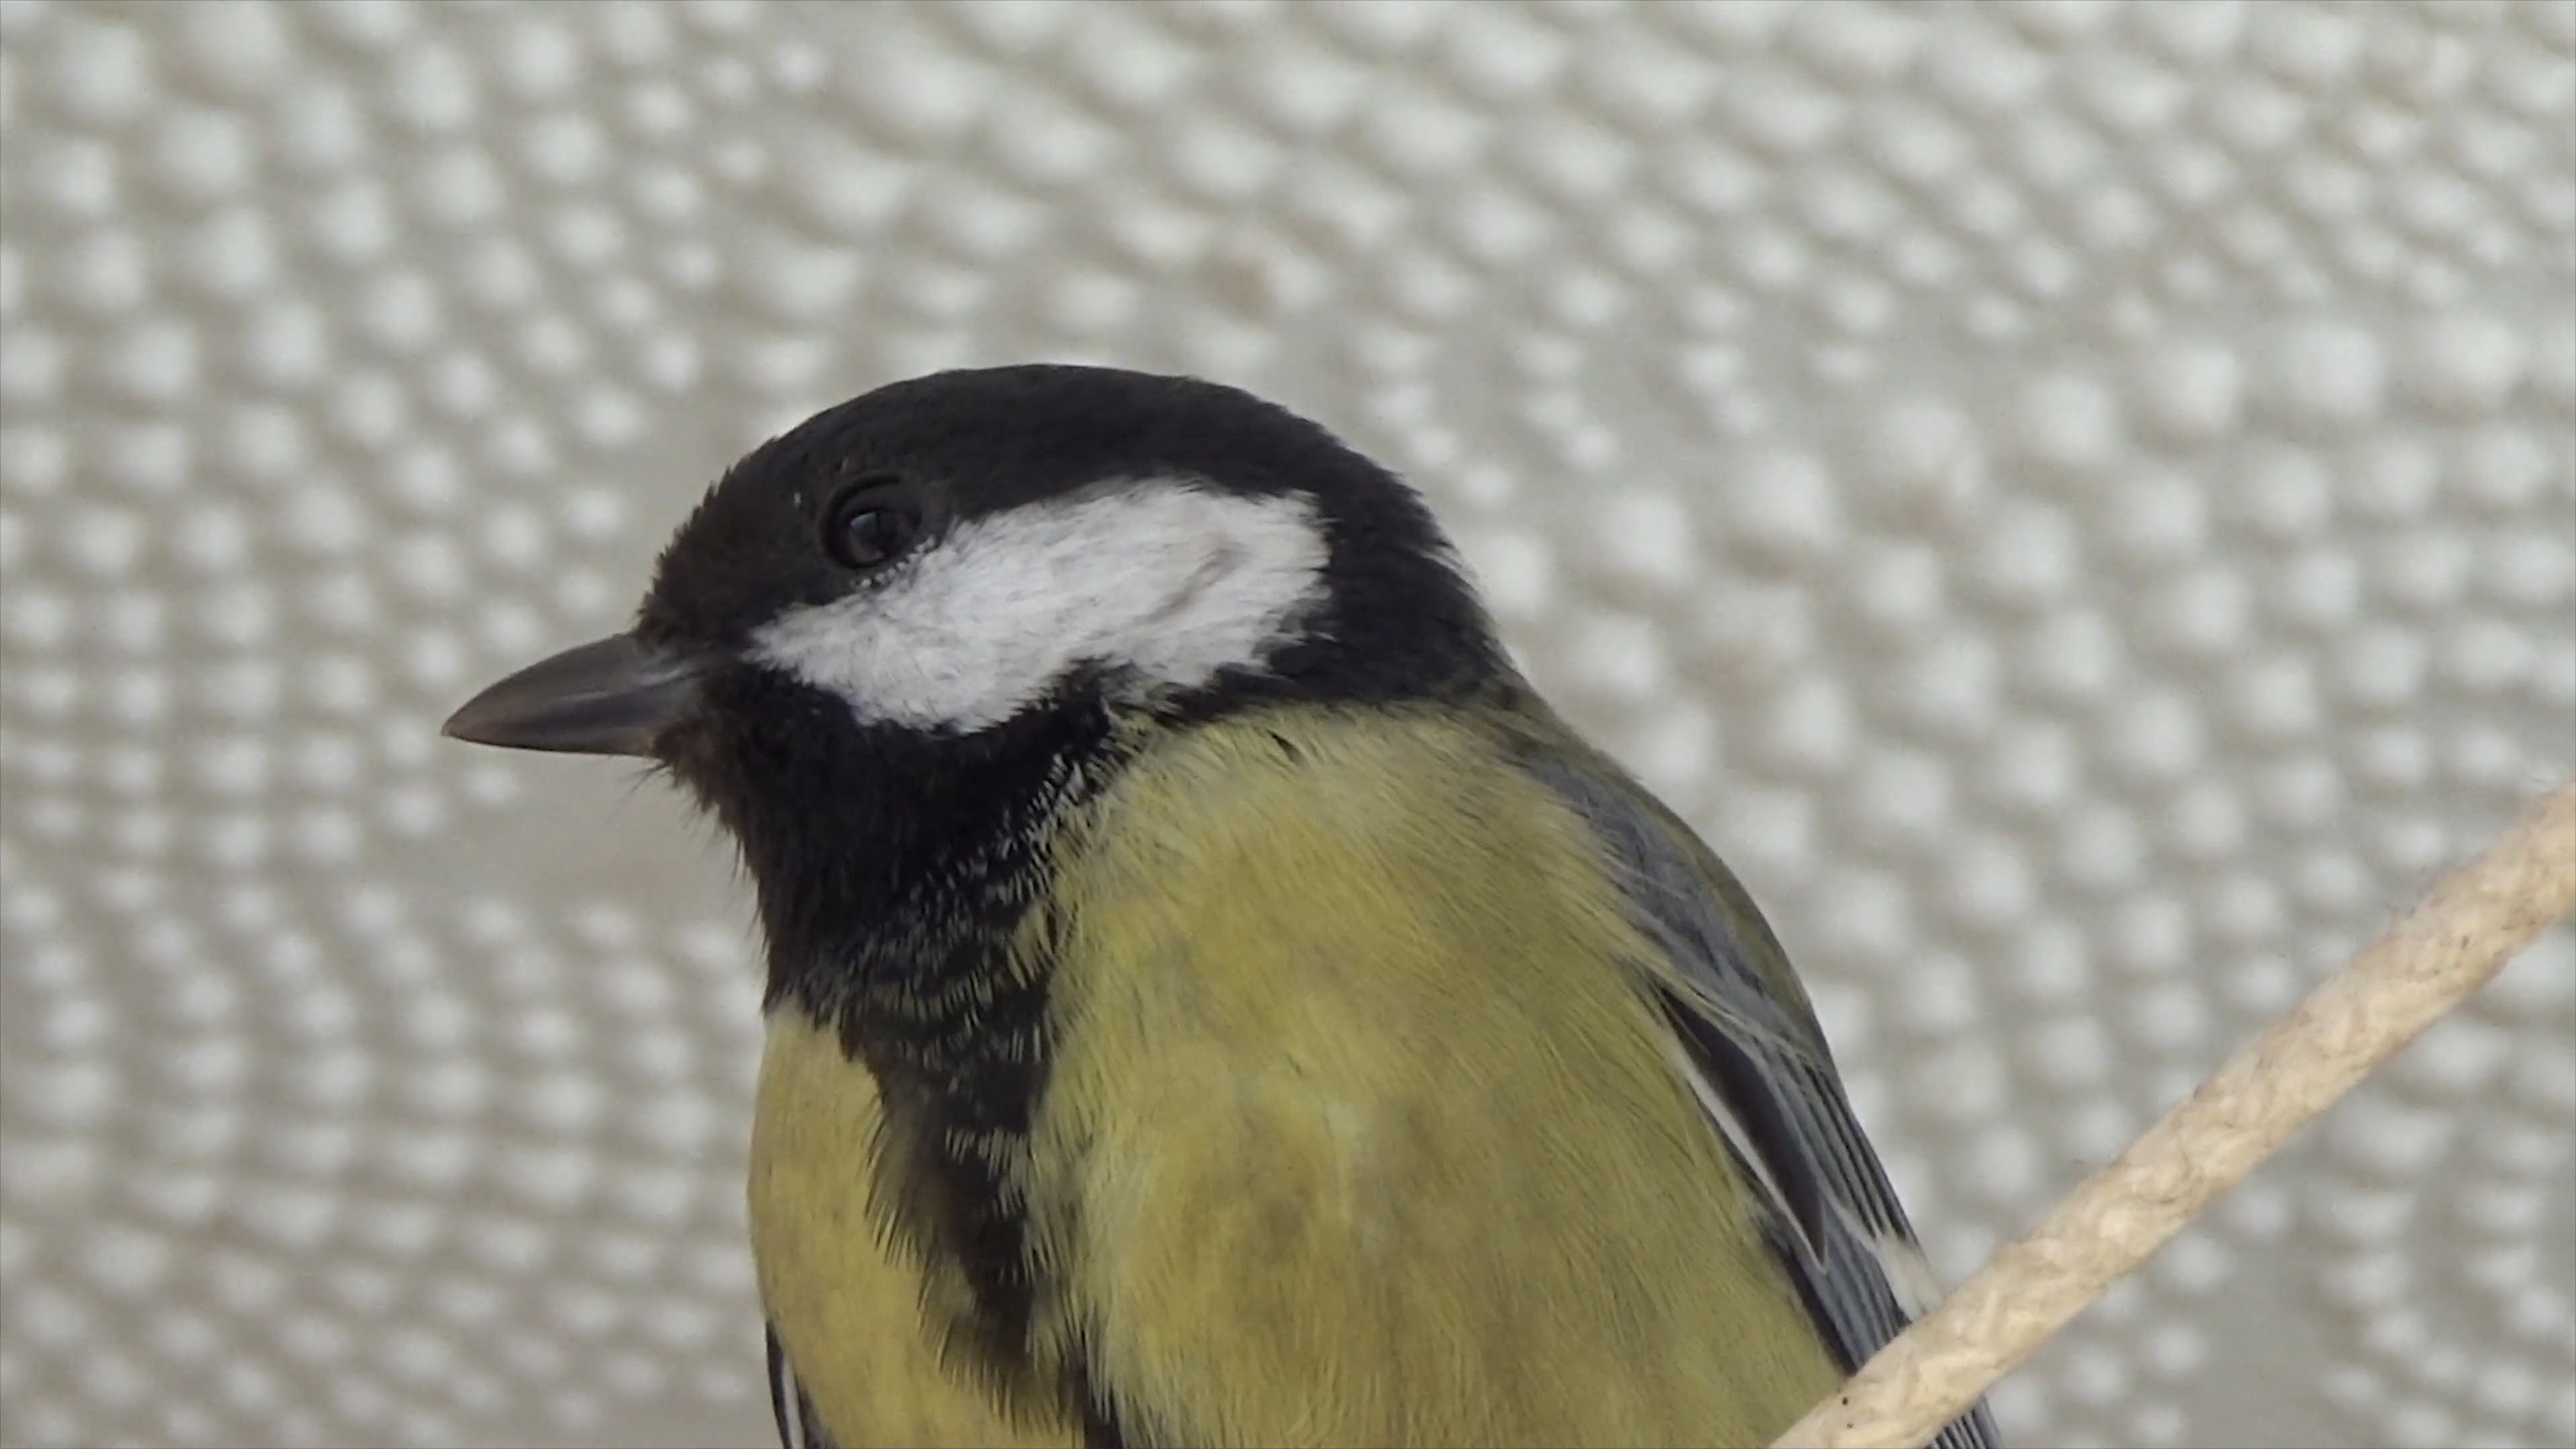 Close-Up Video Of Bird